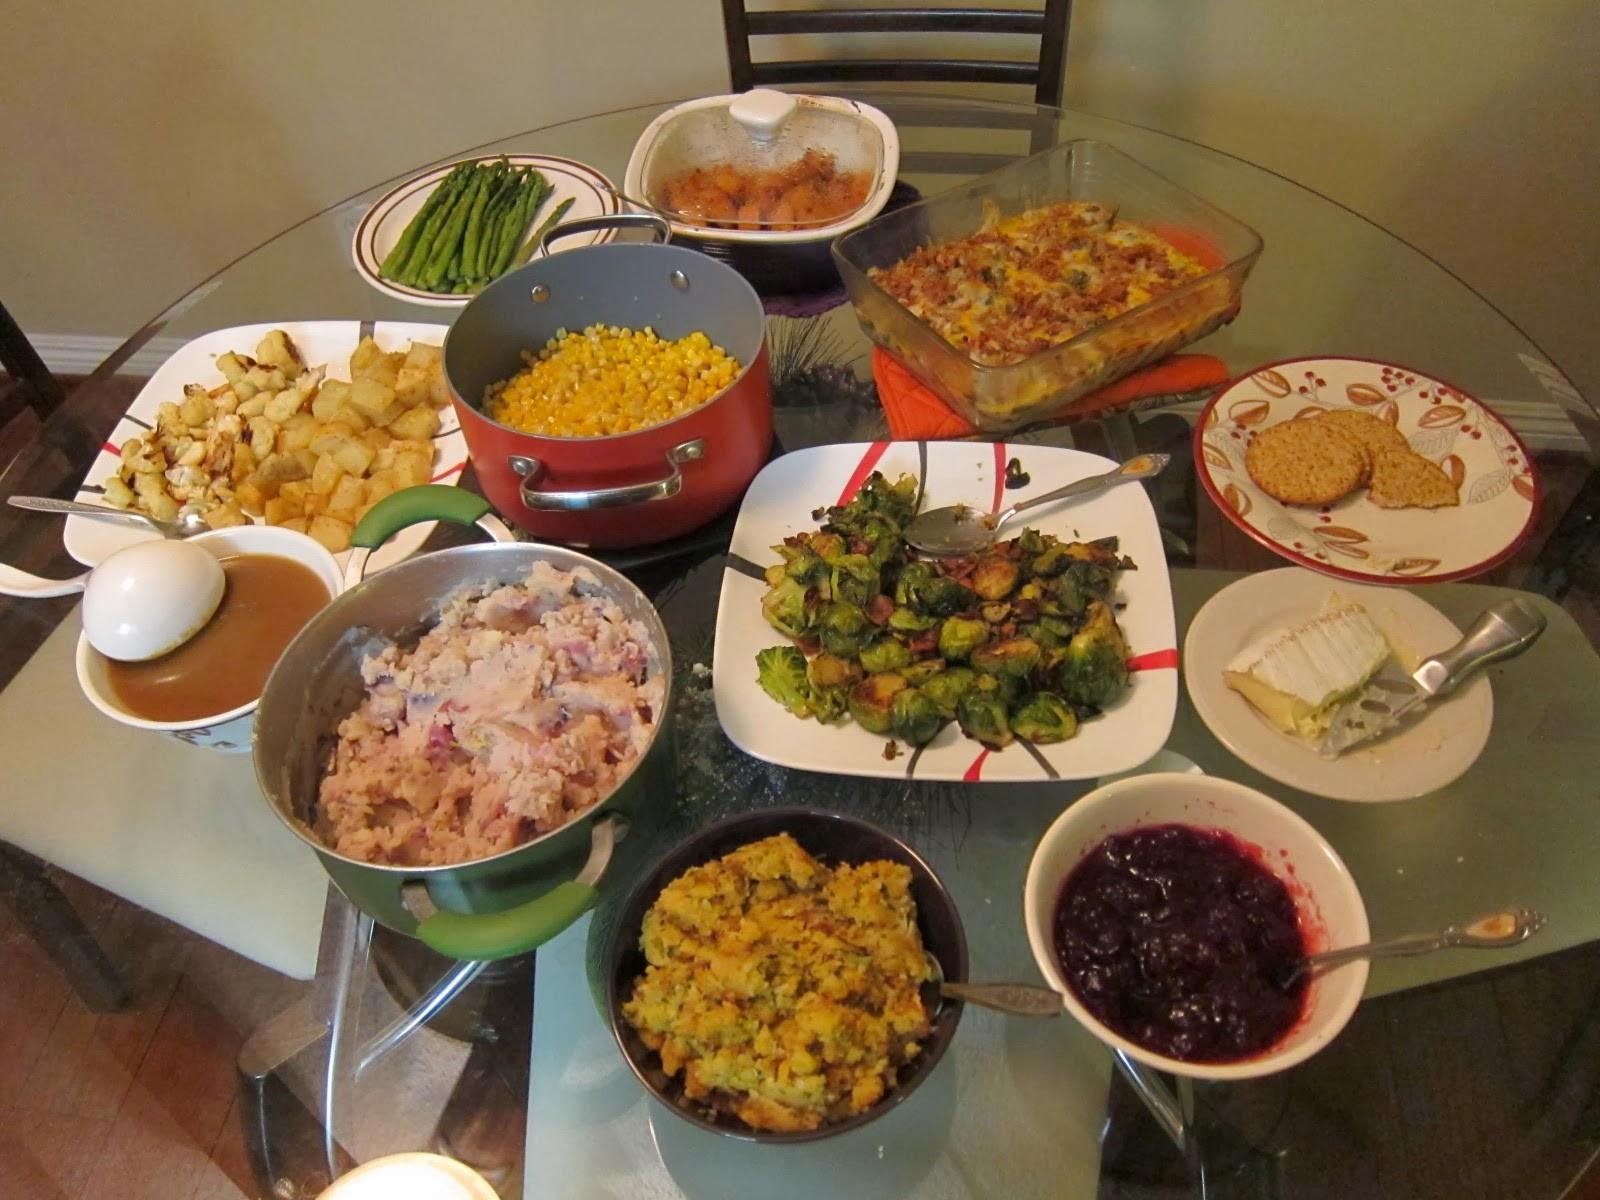 Order Fried Turkey For Thanksgiving  Review Popeyes Cajun Turkey